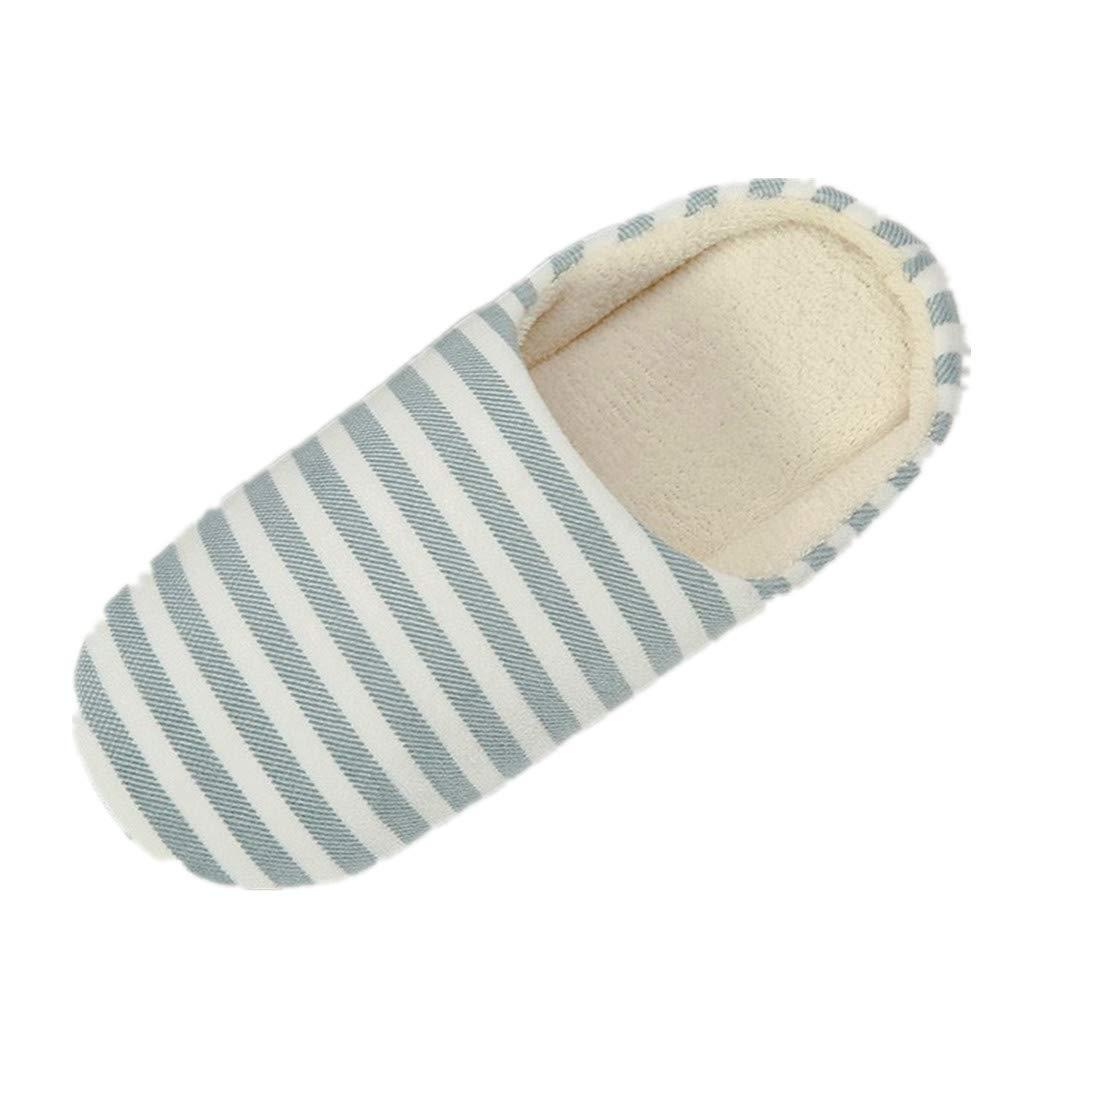 Warm Striped Slipper for Women Men Indoors Anti-slip Winter House Shoes